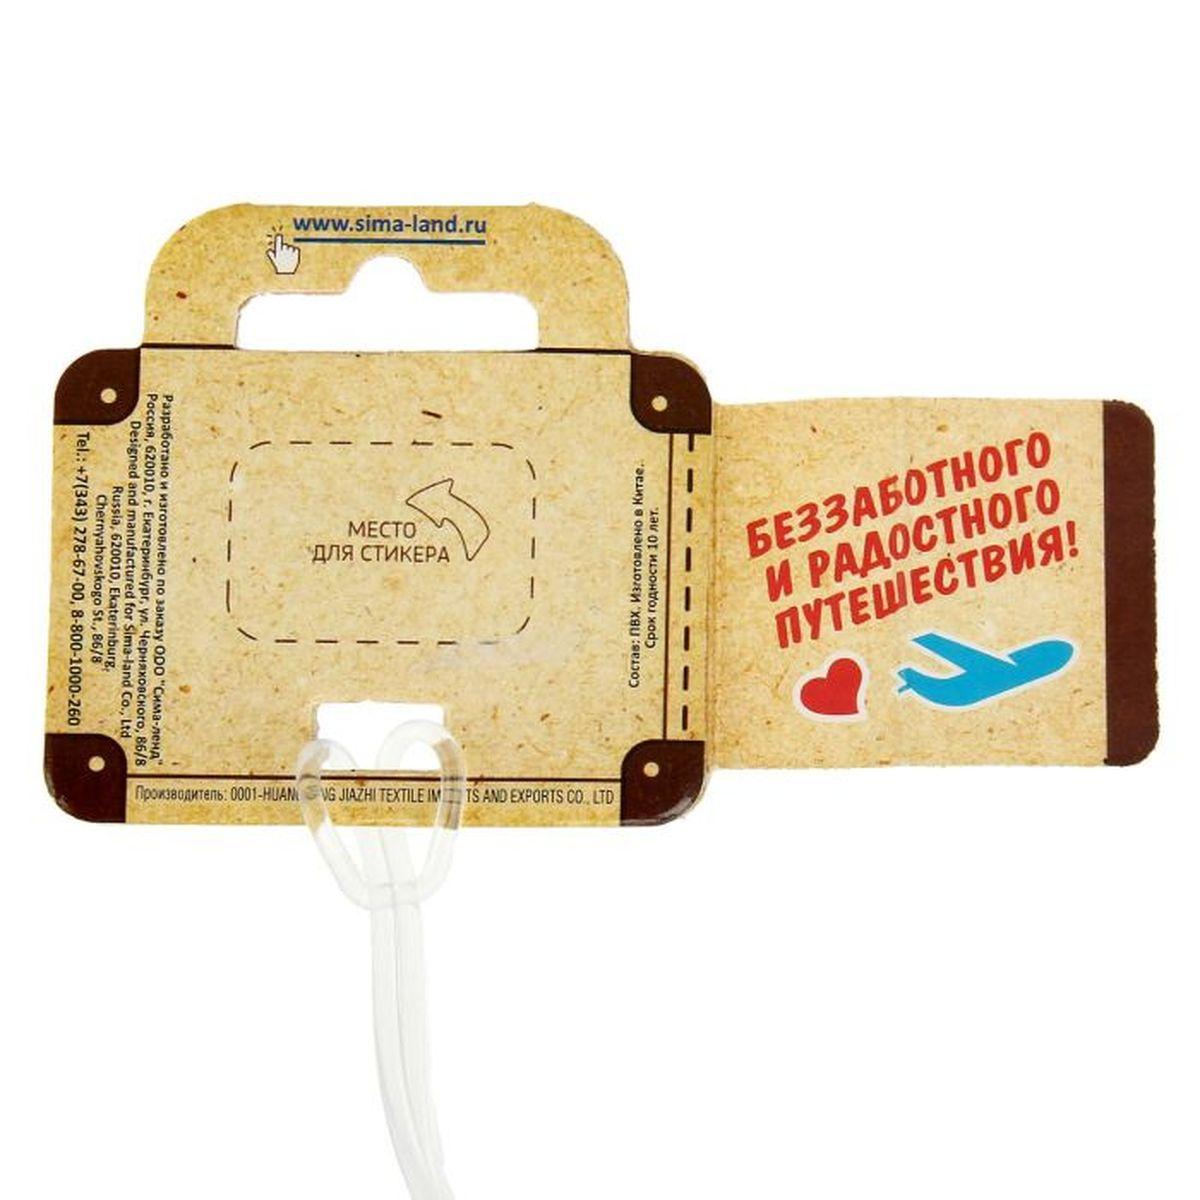 "Бирка на чемодан Sima-land ""Руки прочь"", 6,5 х 11 см. 1156276"